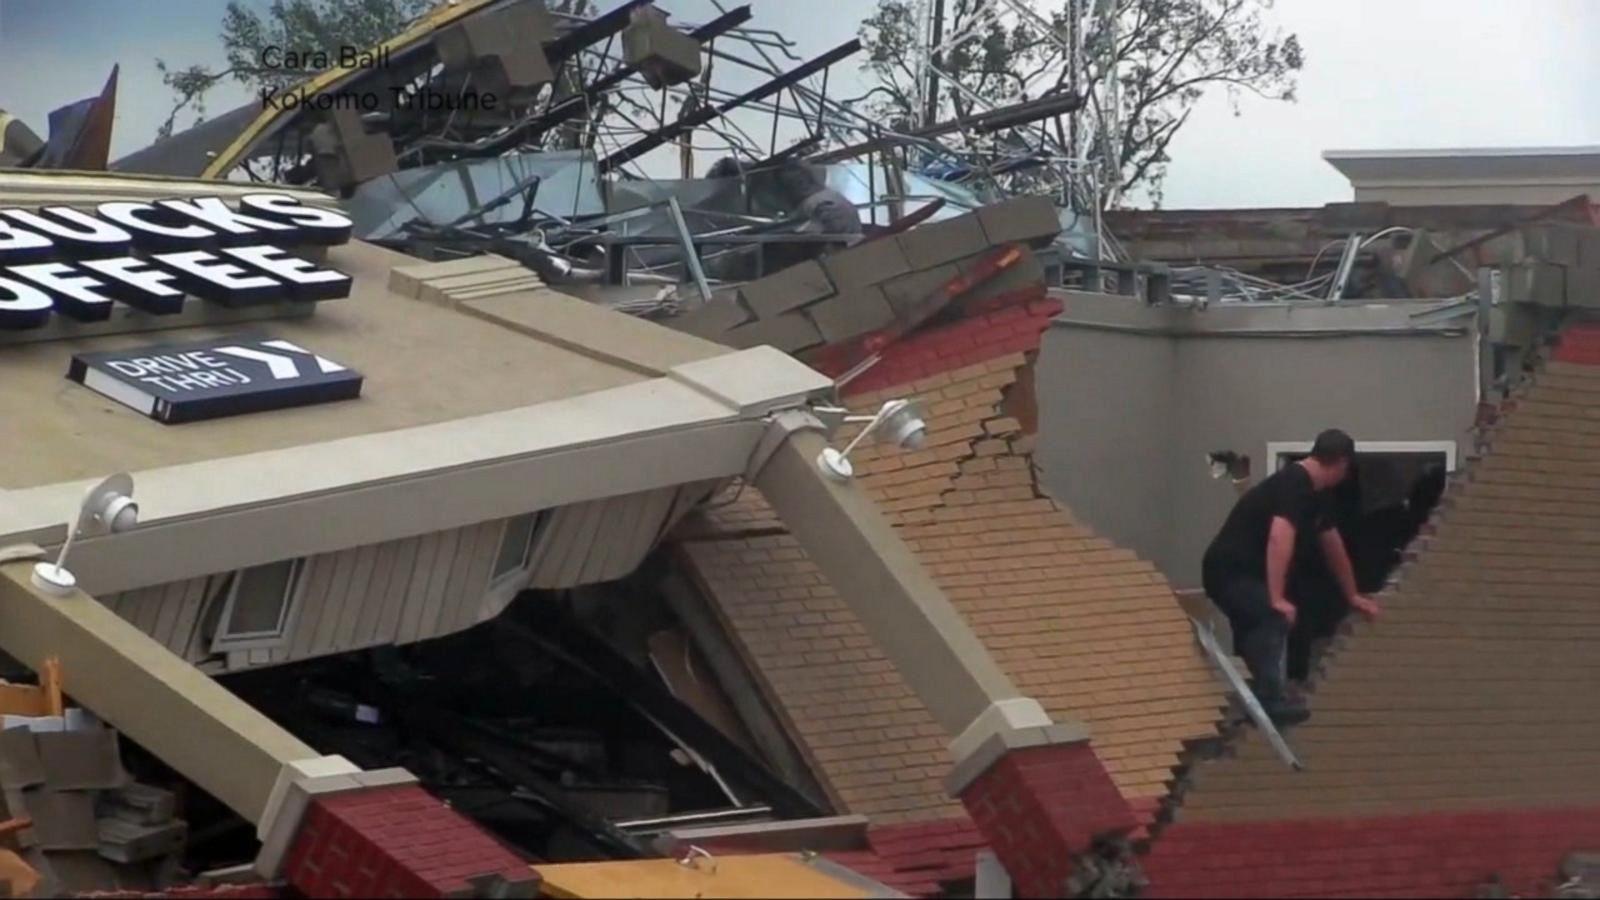 VIDEO: Strong Storms Wreak Havoc Across the Heartland